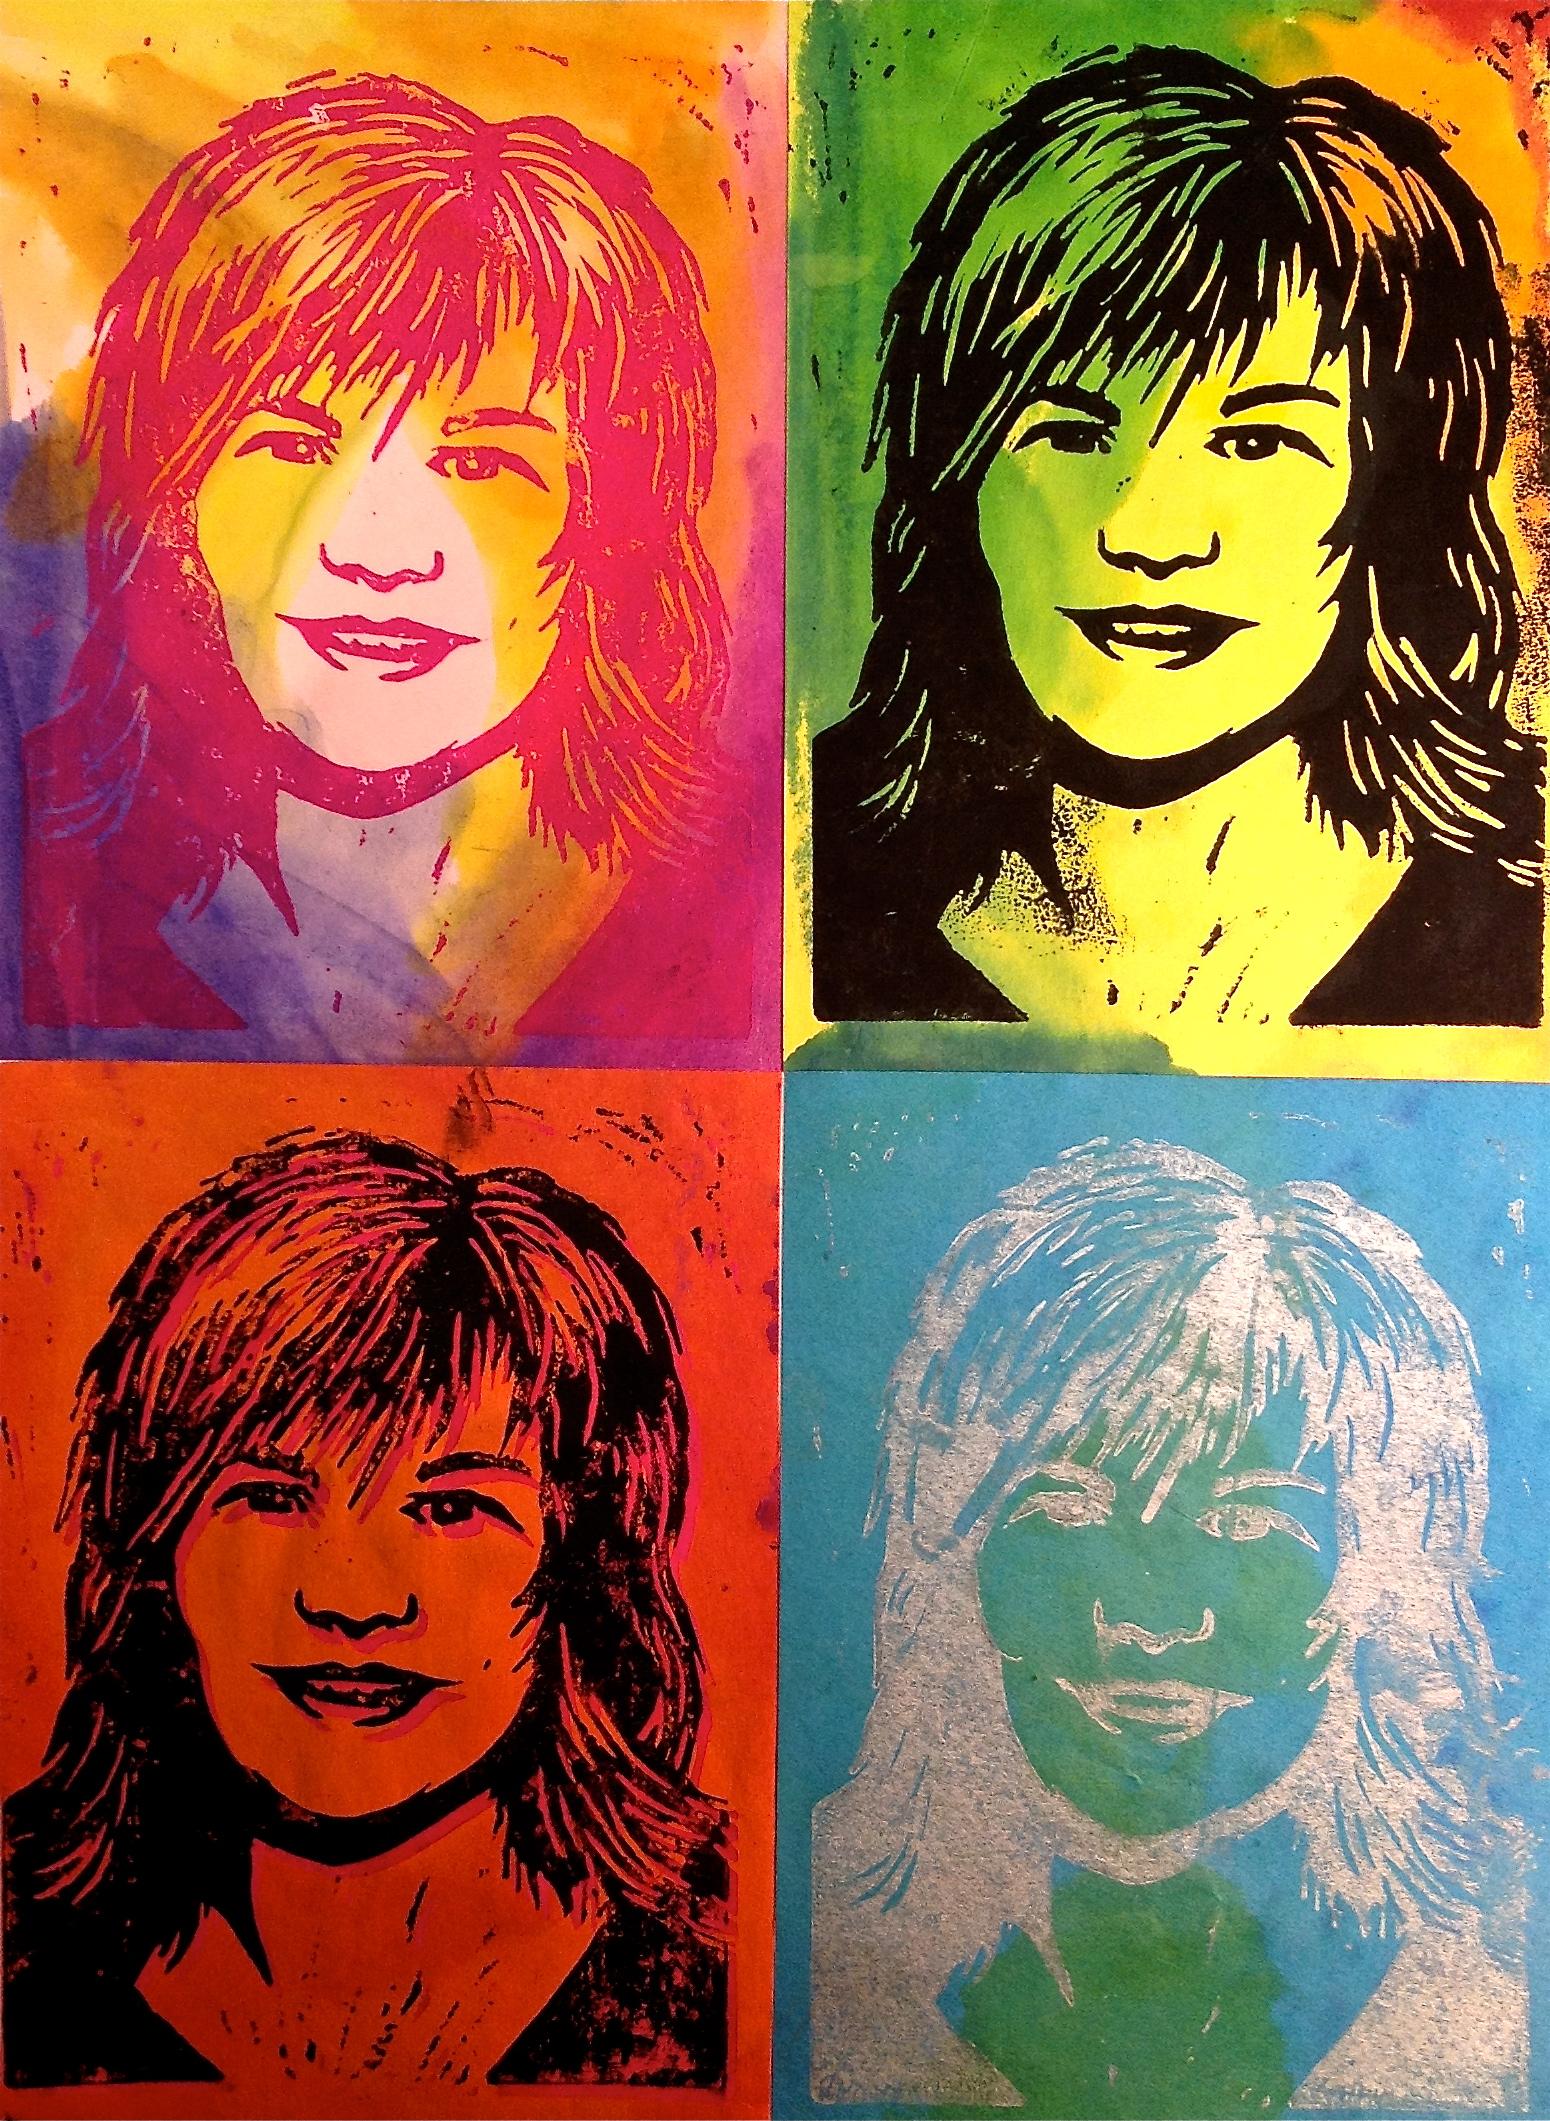 Pop Art Self-Portrait Warhol Printmaking Lesson - Create Art with ME